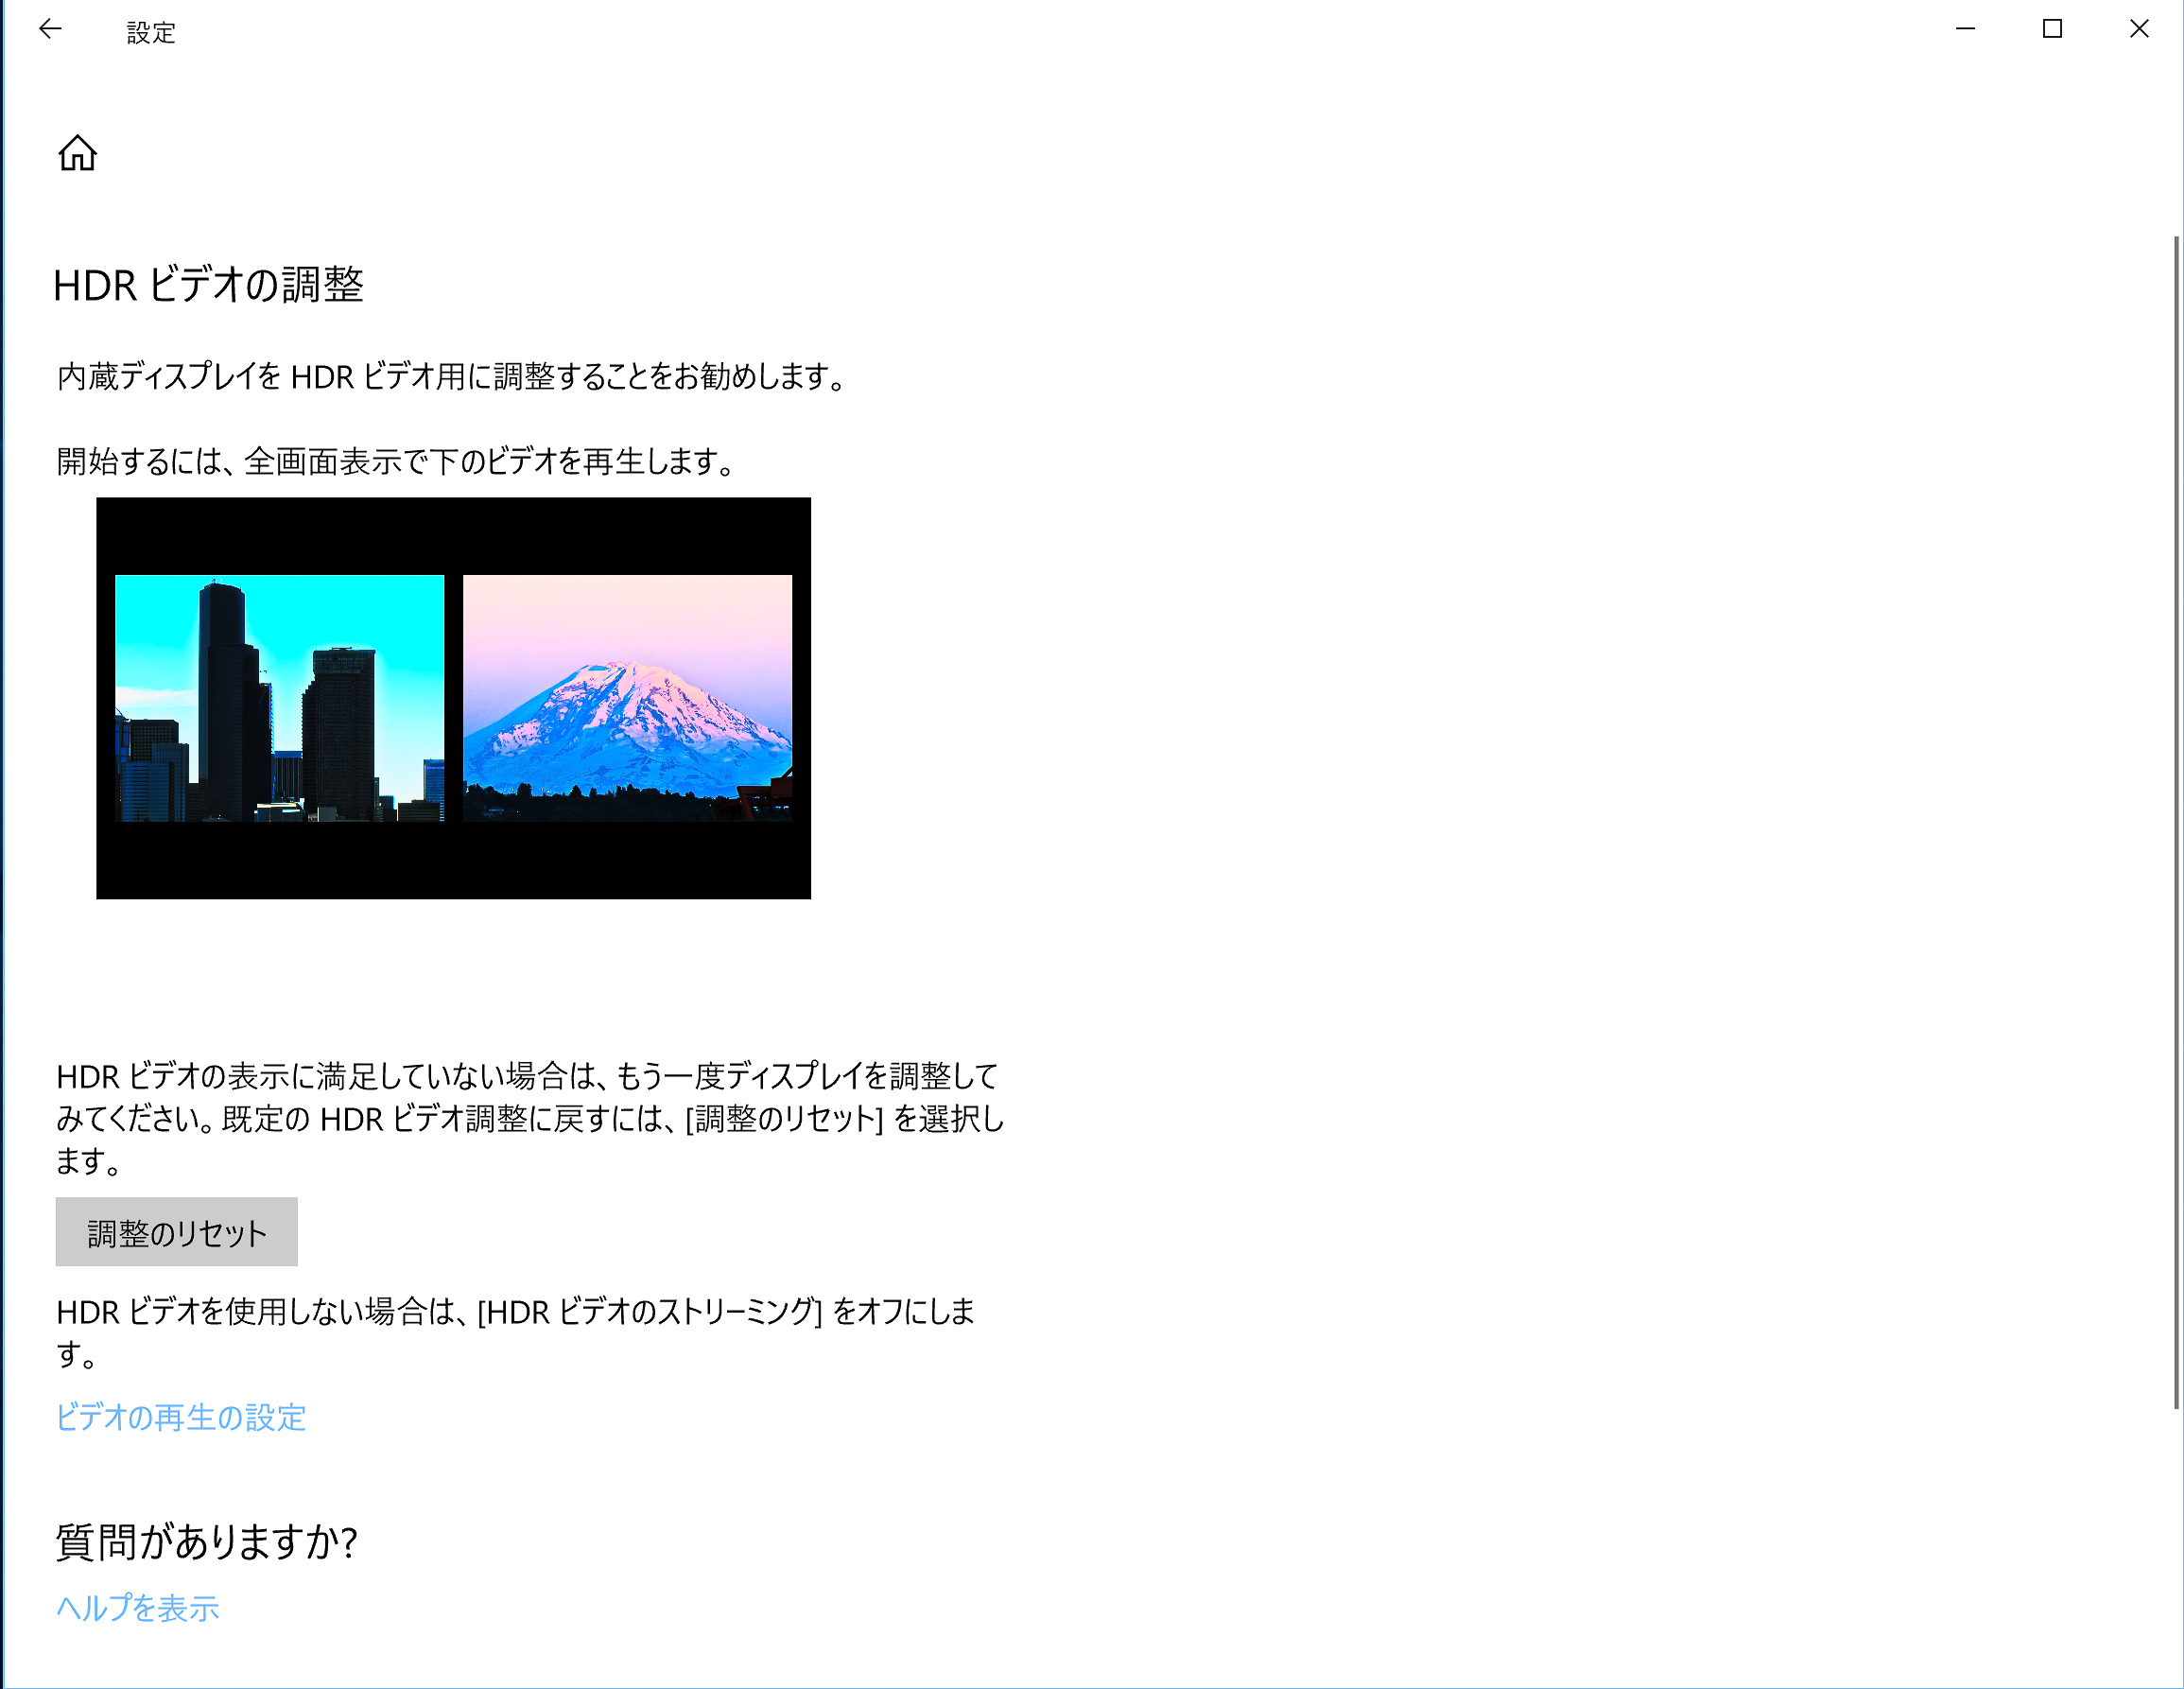 HDRビデオの見え方の調整。まず中央のビデオを「全画面再生」にして設定する。